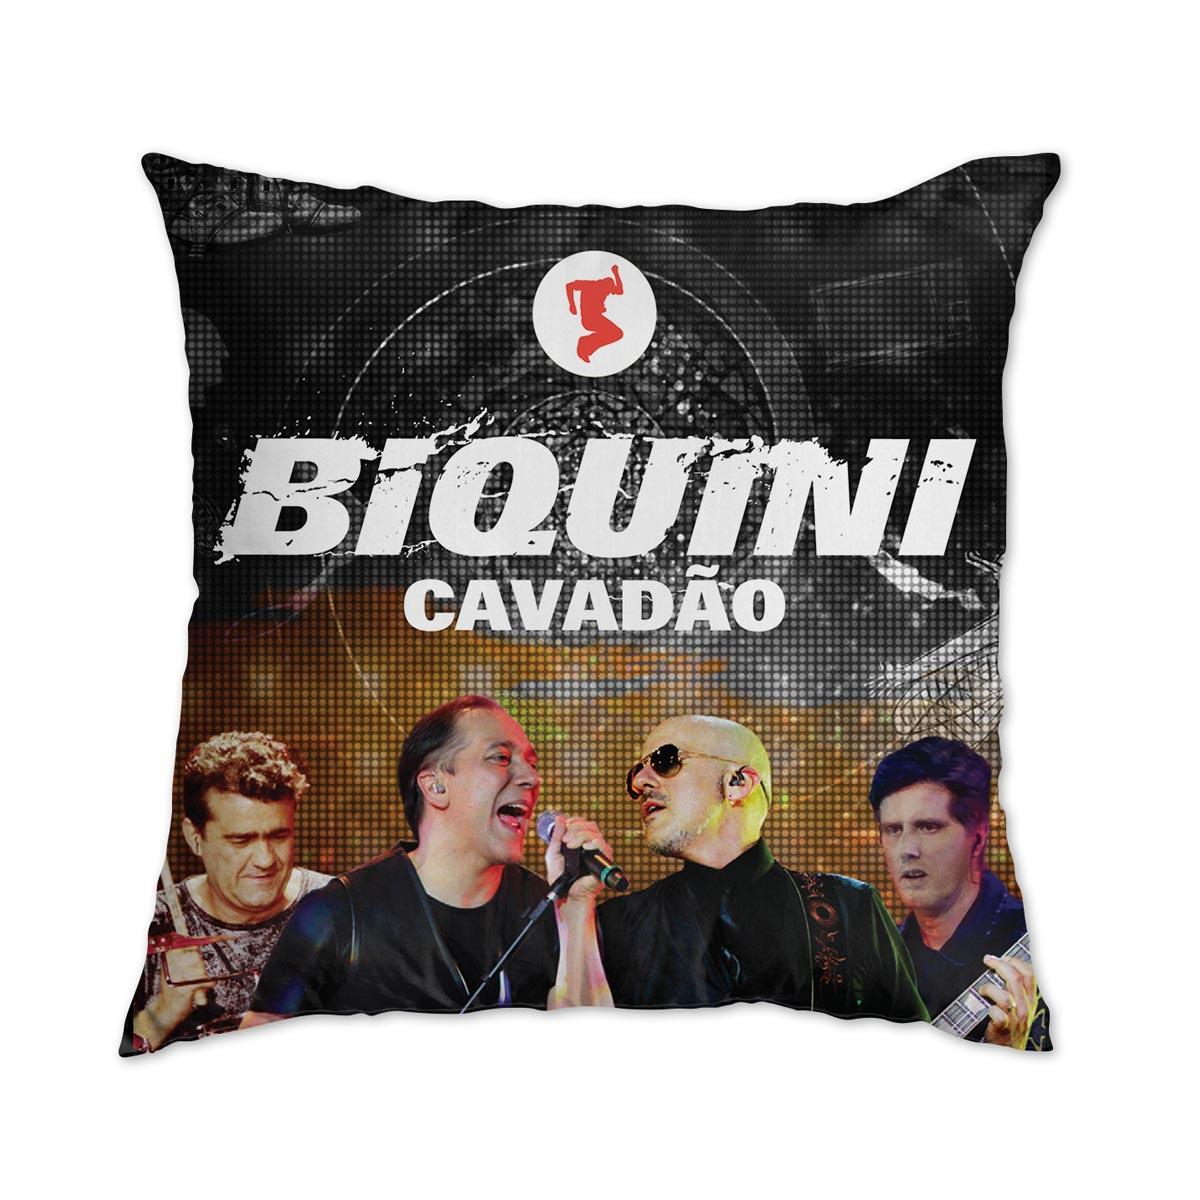 Almofada Biquini Cavadão Capa